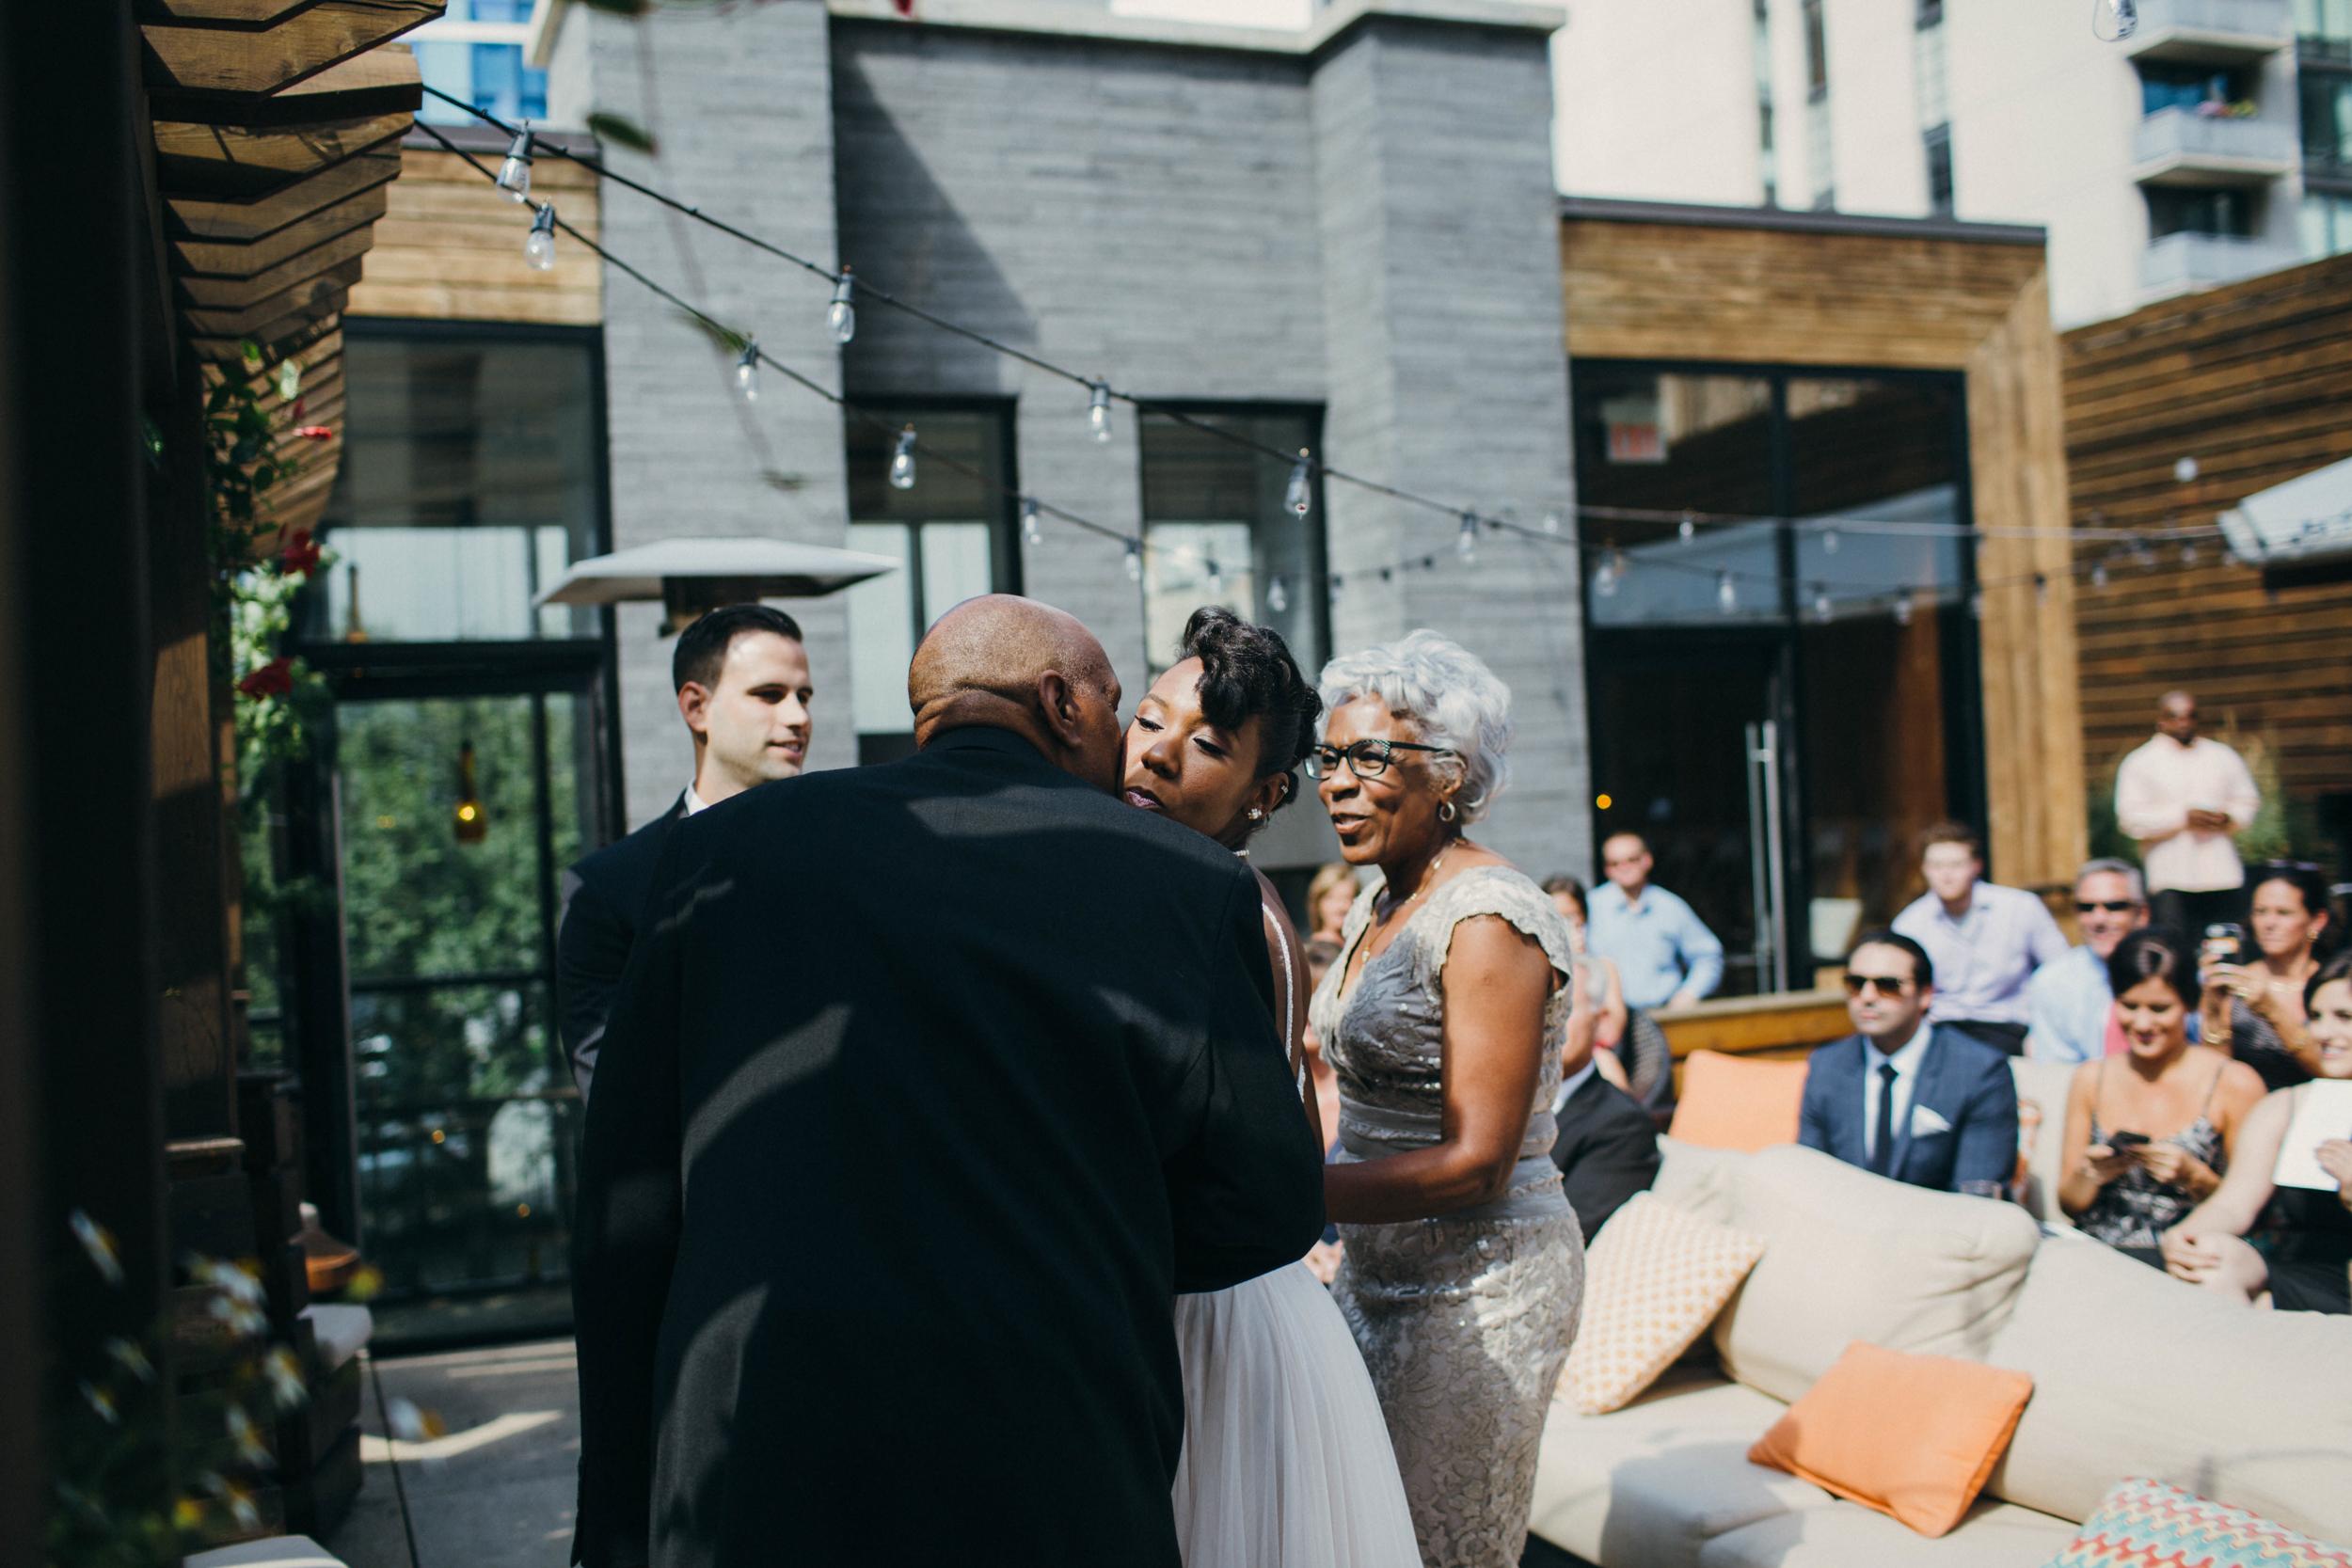 chicago.wedding.urban.intimate.zed451.lake.milton olive park-47.jpg